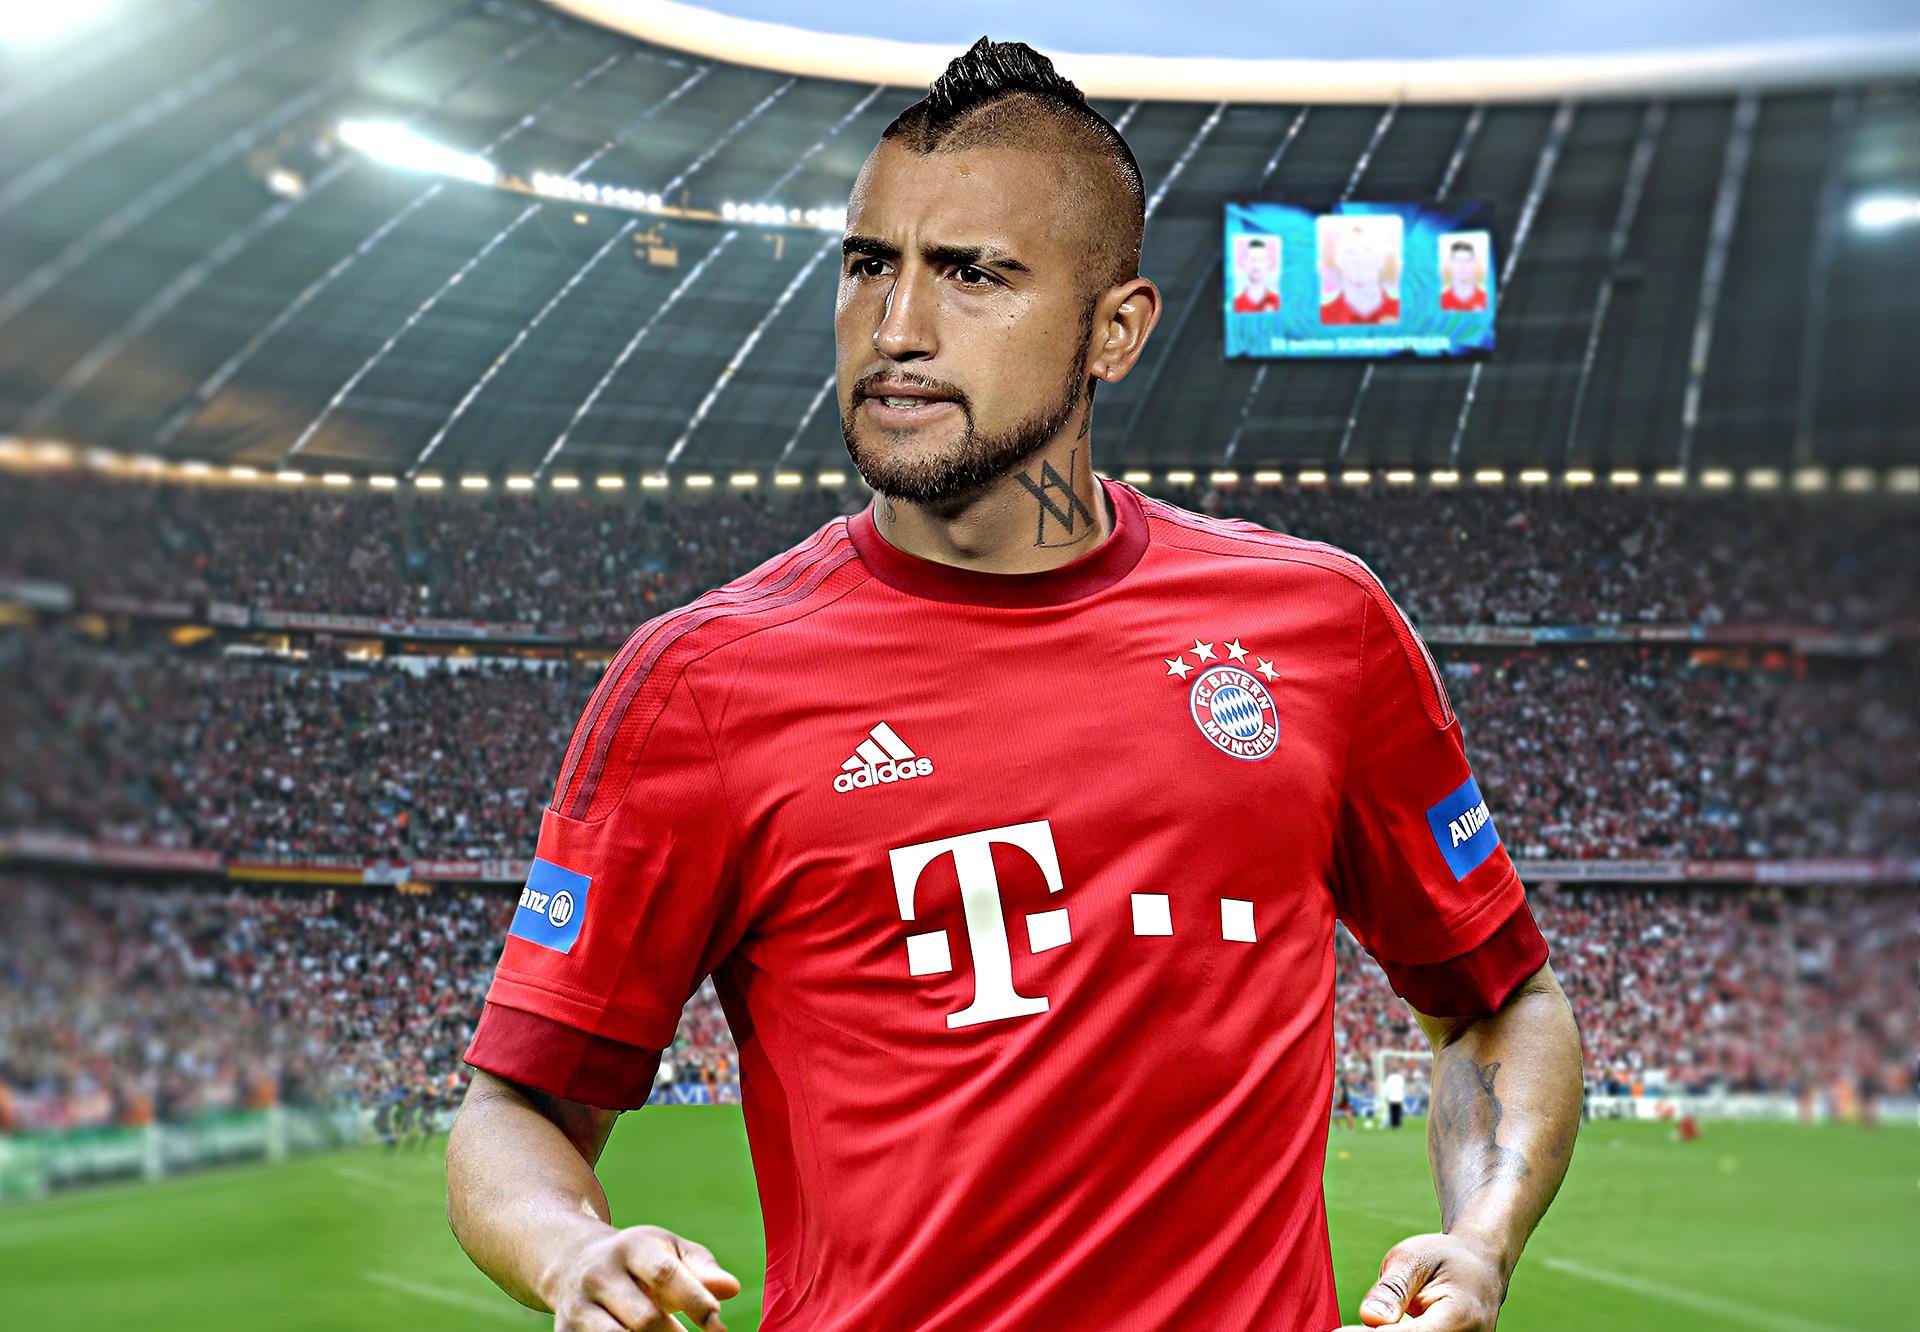 Arturo Vidal sets to Wear Bayern Munich Jersey, Leaves Juventus